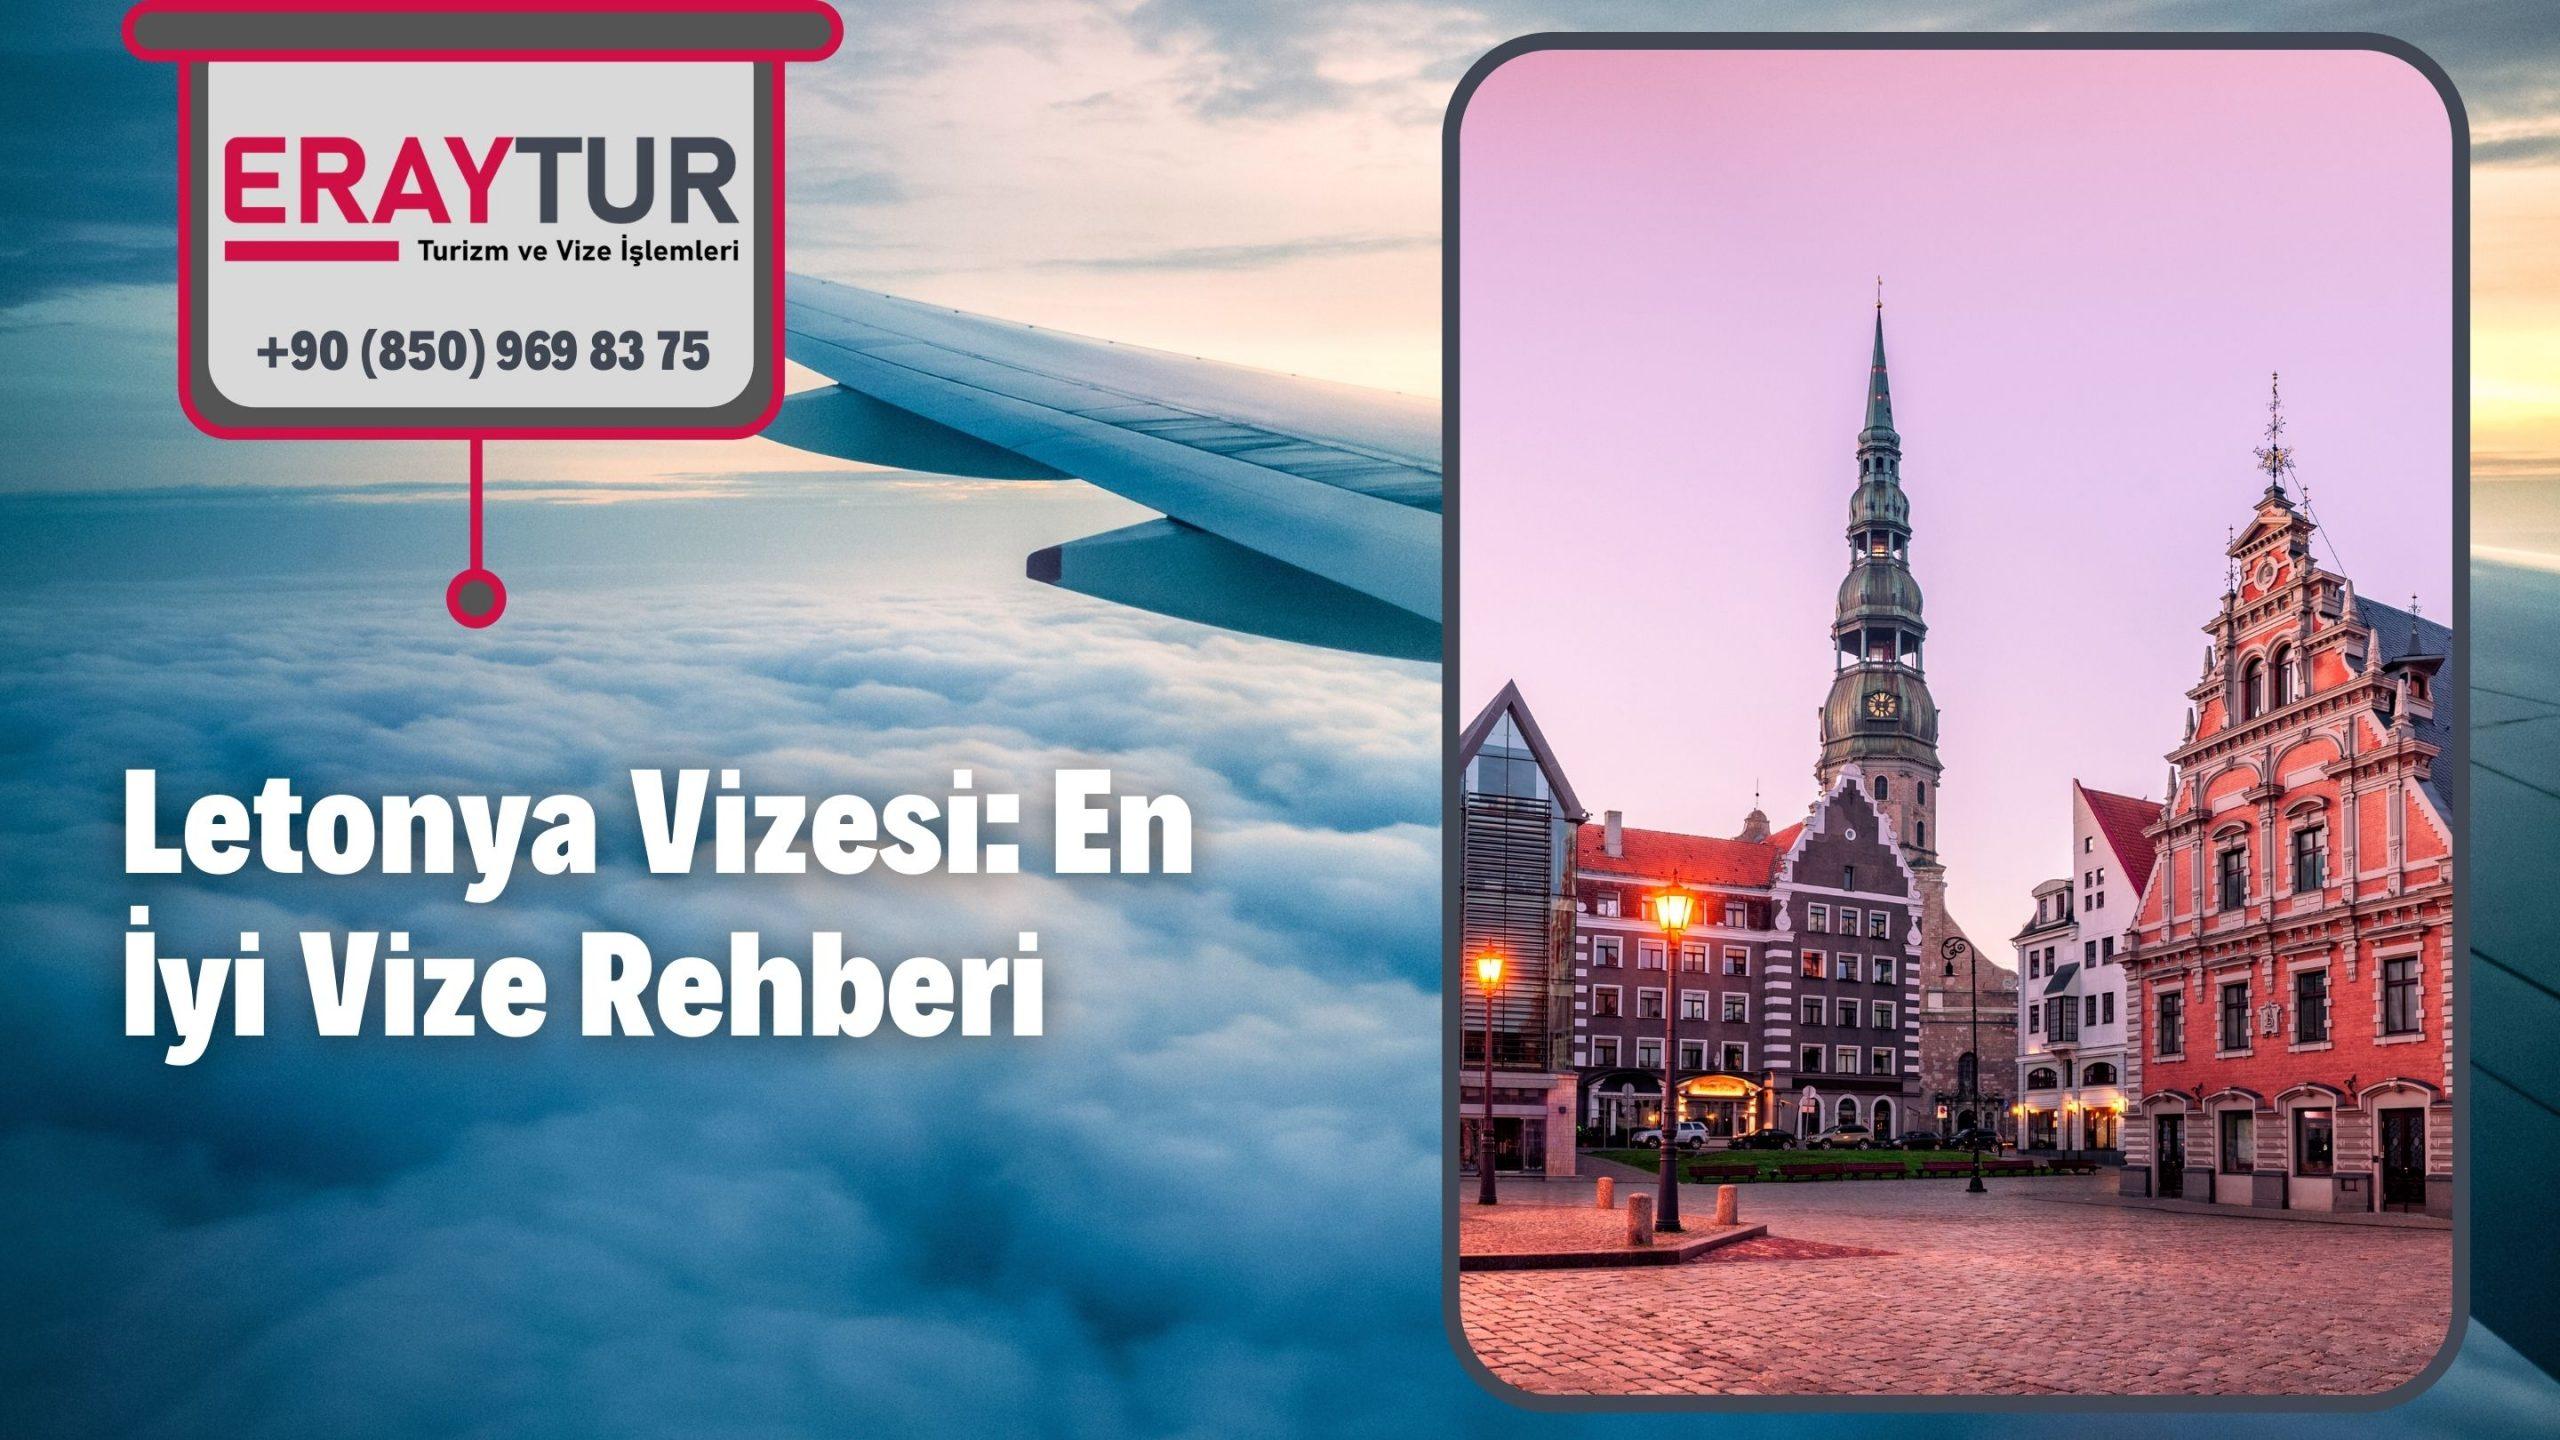 Letonya Vizesi: En İyi Vize Rehberi 1 – letonya vizesi en iyi vize rehberi 2 scaled